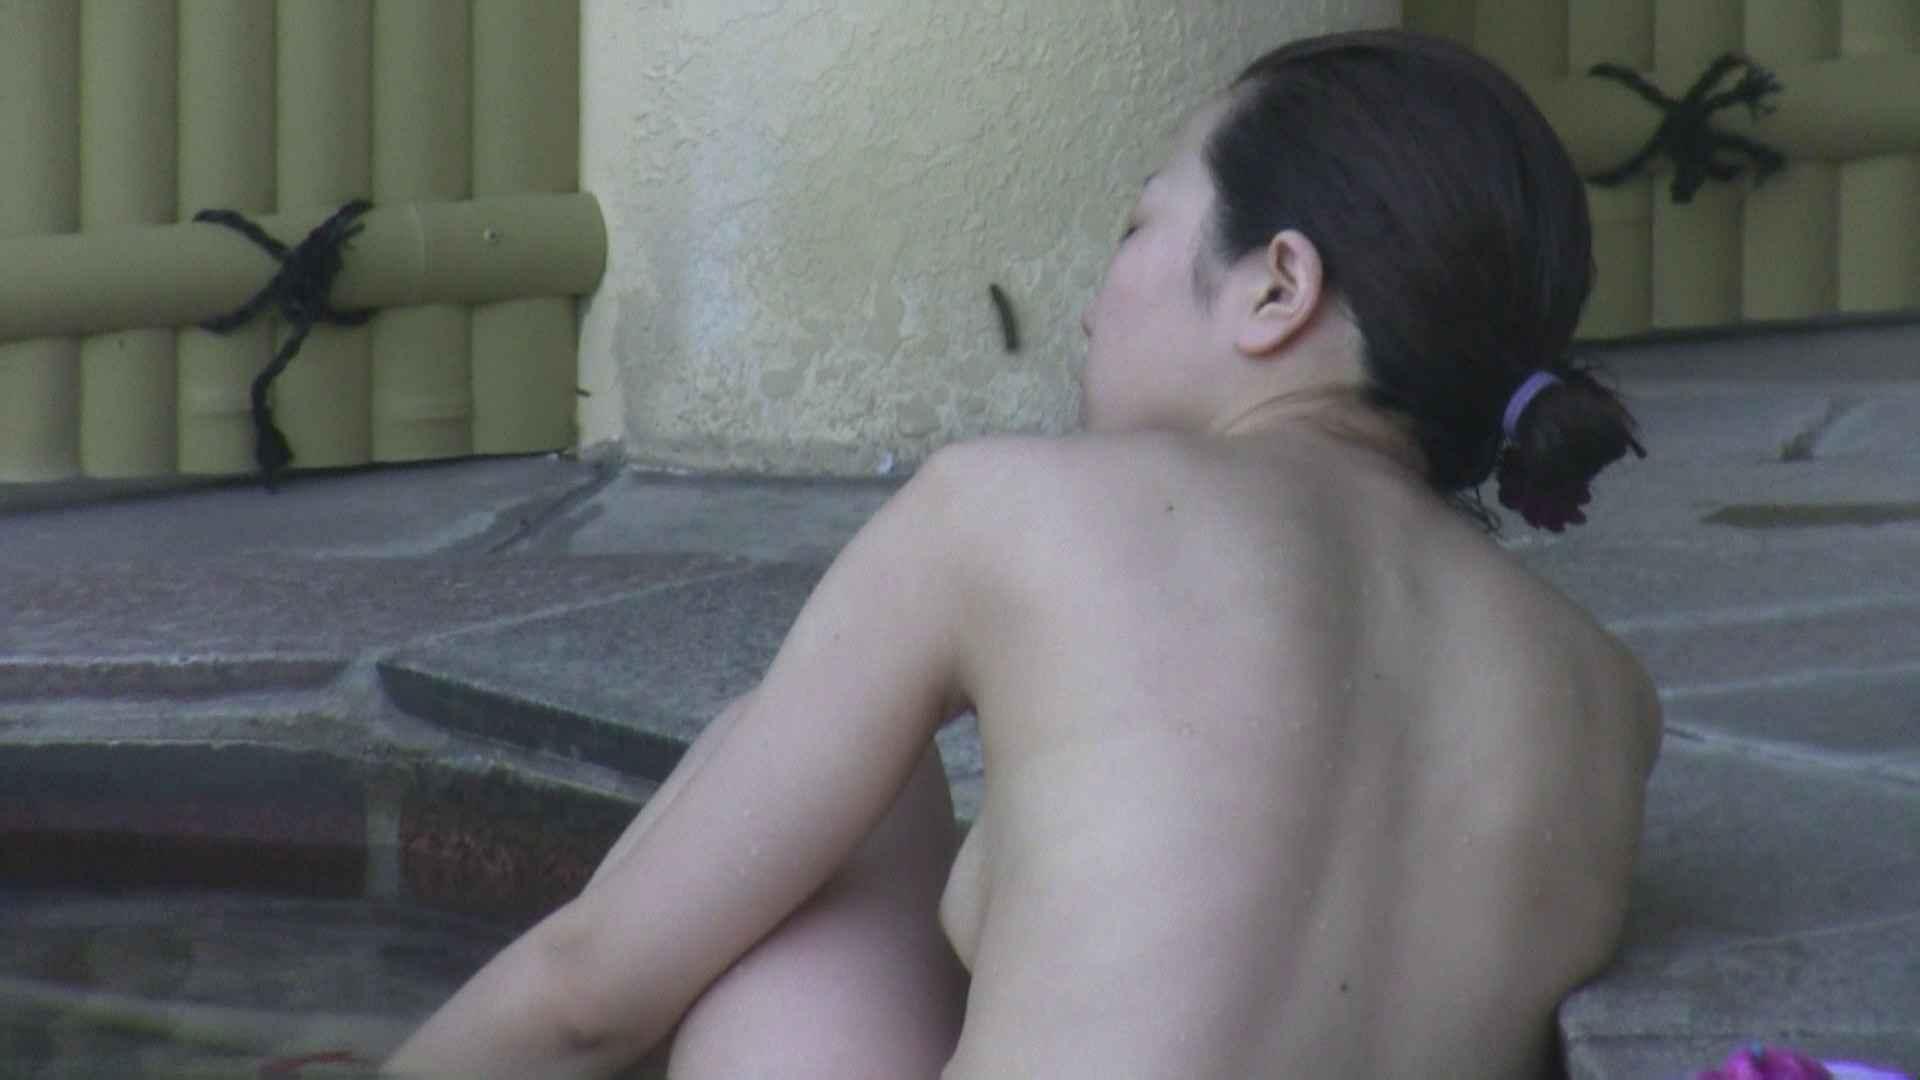 Aquaな露天風呂Vol.88【VIP限定】 OLのエロ生活 | 露天風呂  61連発 49